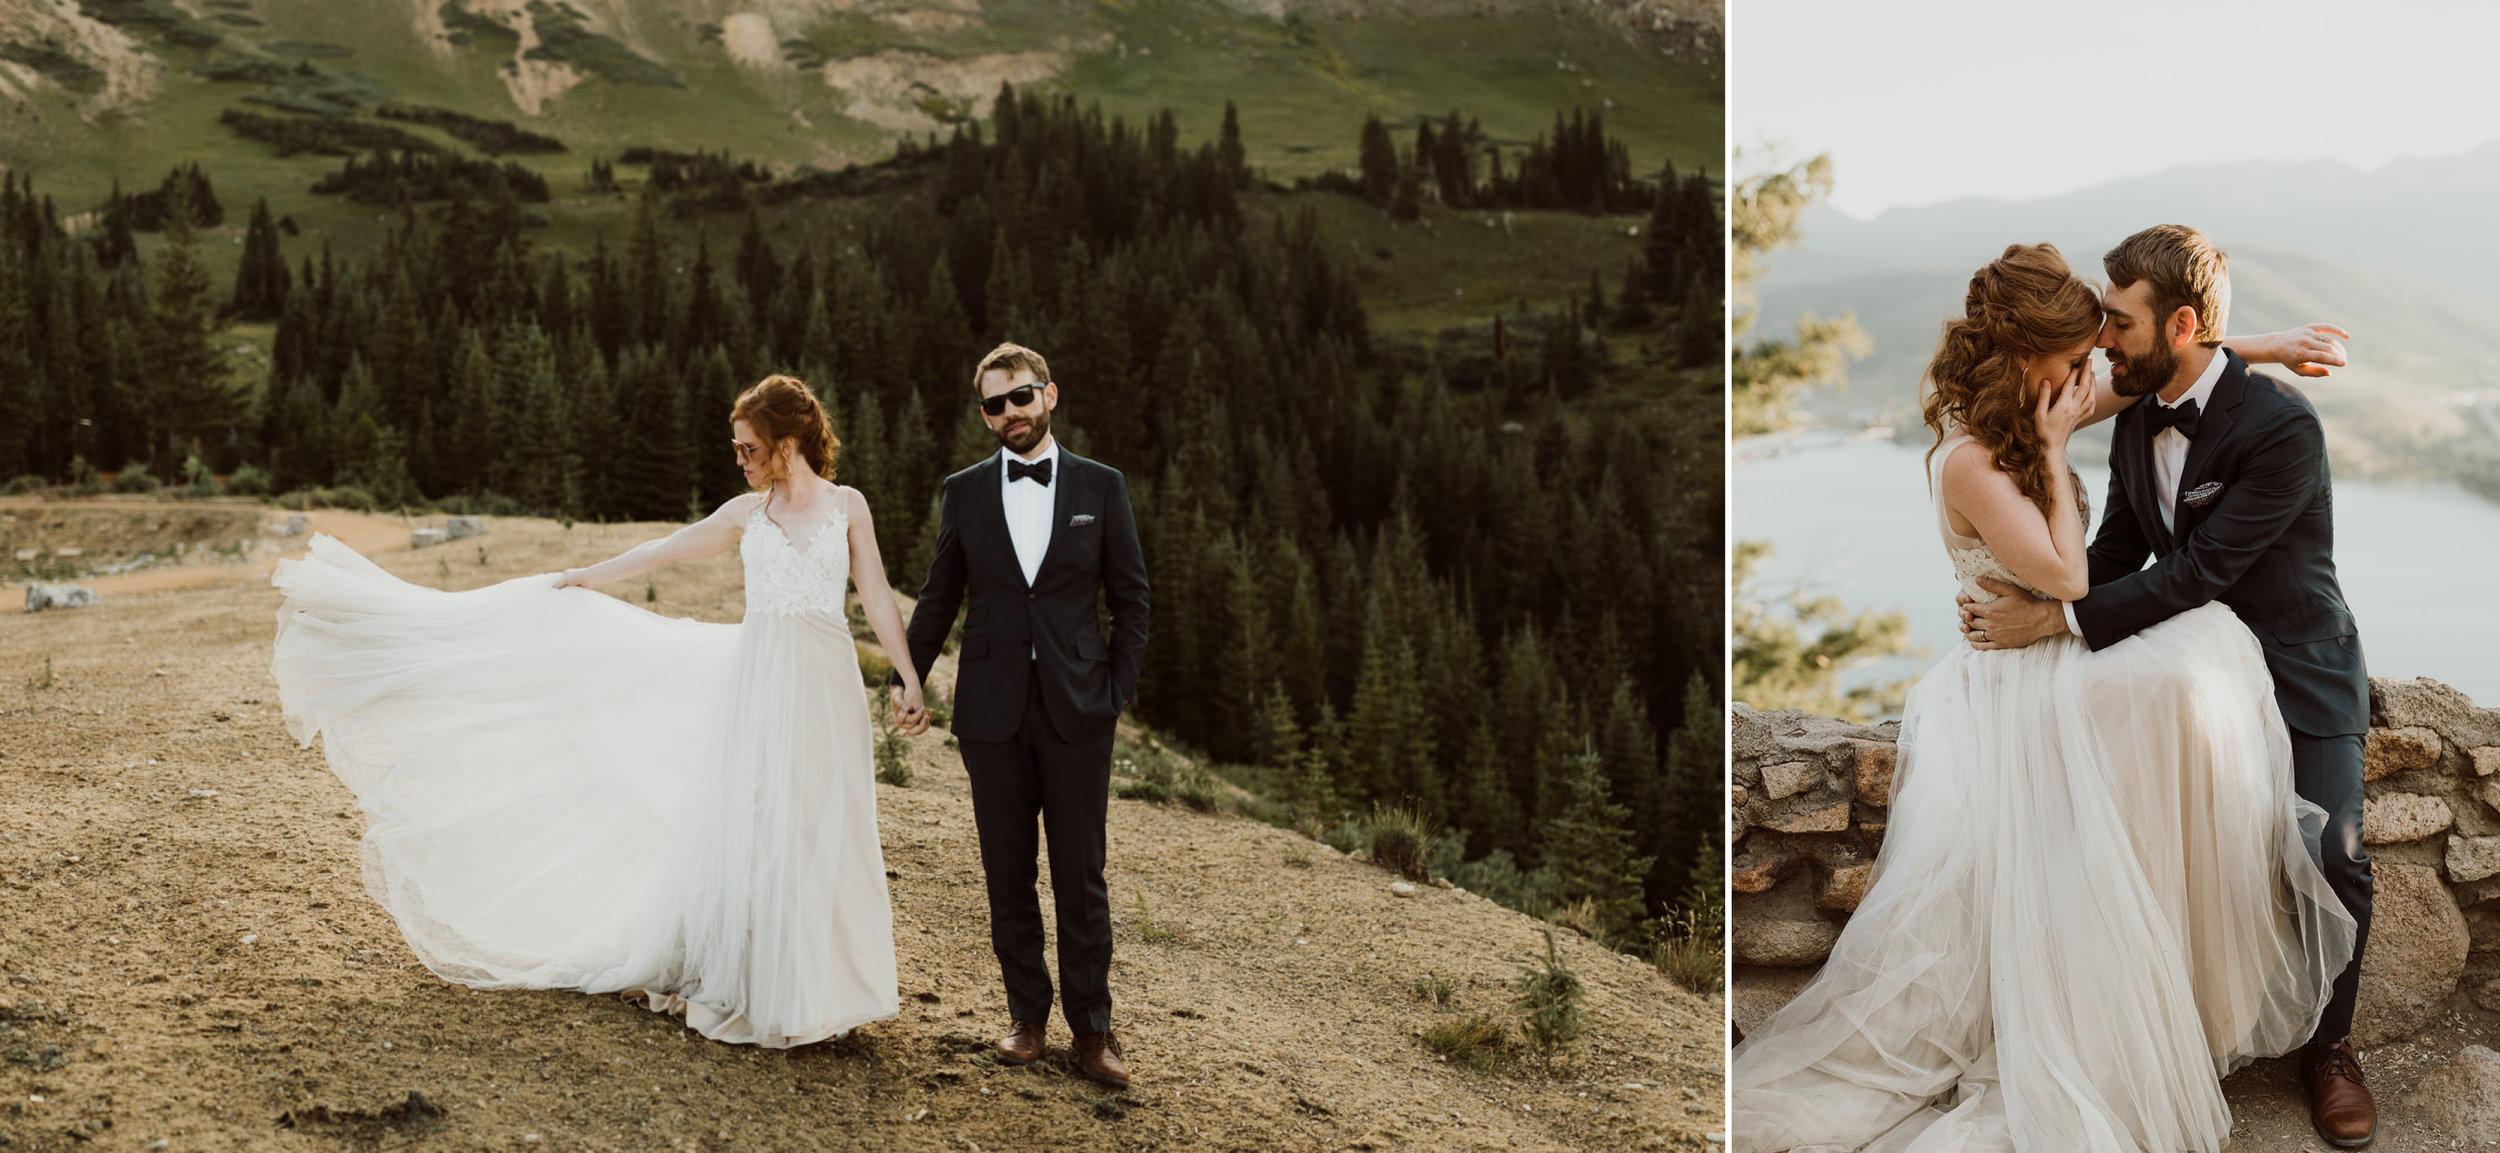 17-8-adventure-wedding-photographer-16.jpg